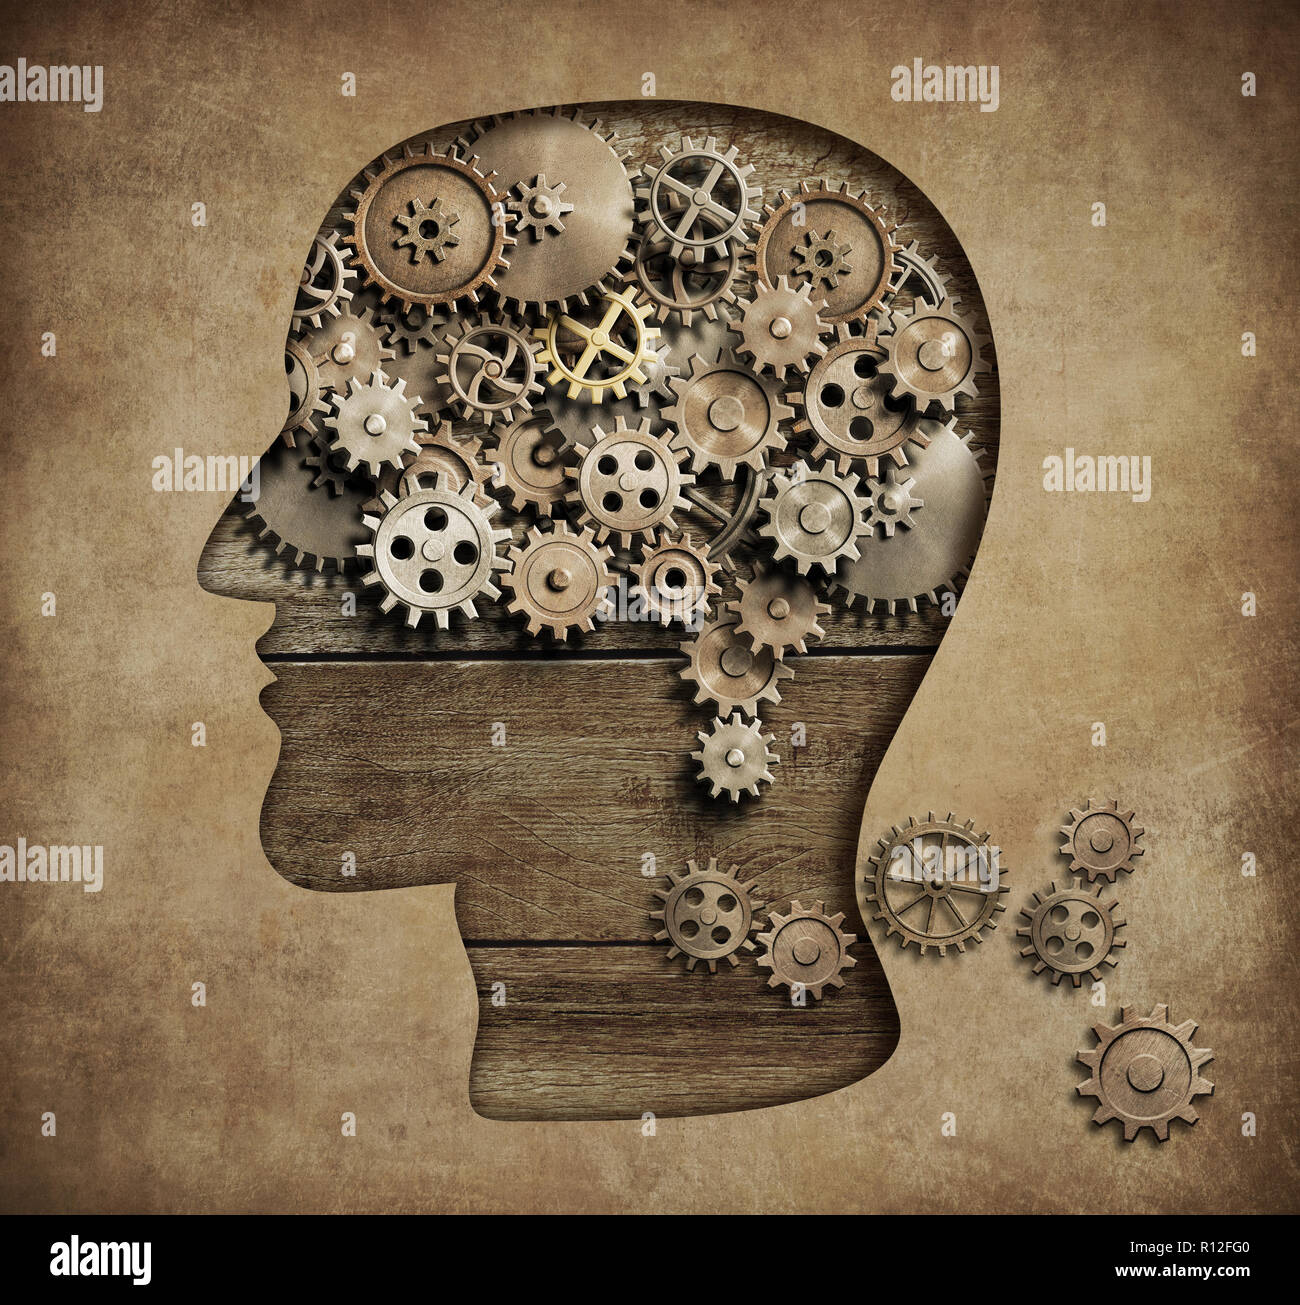 Psychology concept 3d illustration - Stock Image